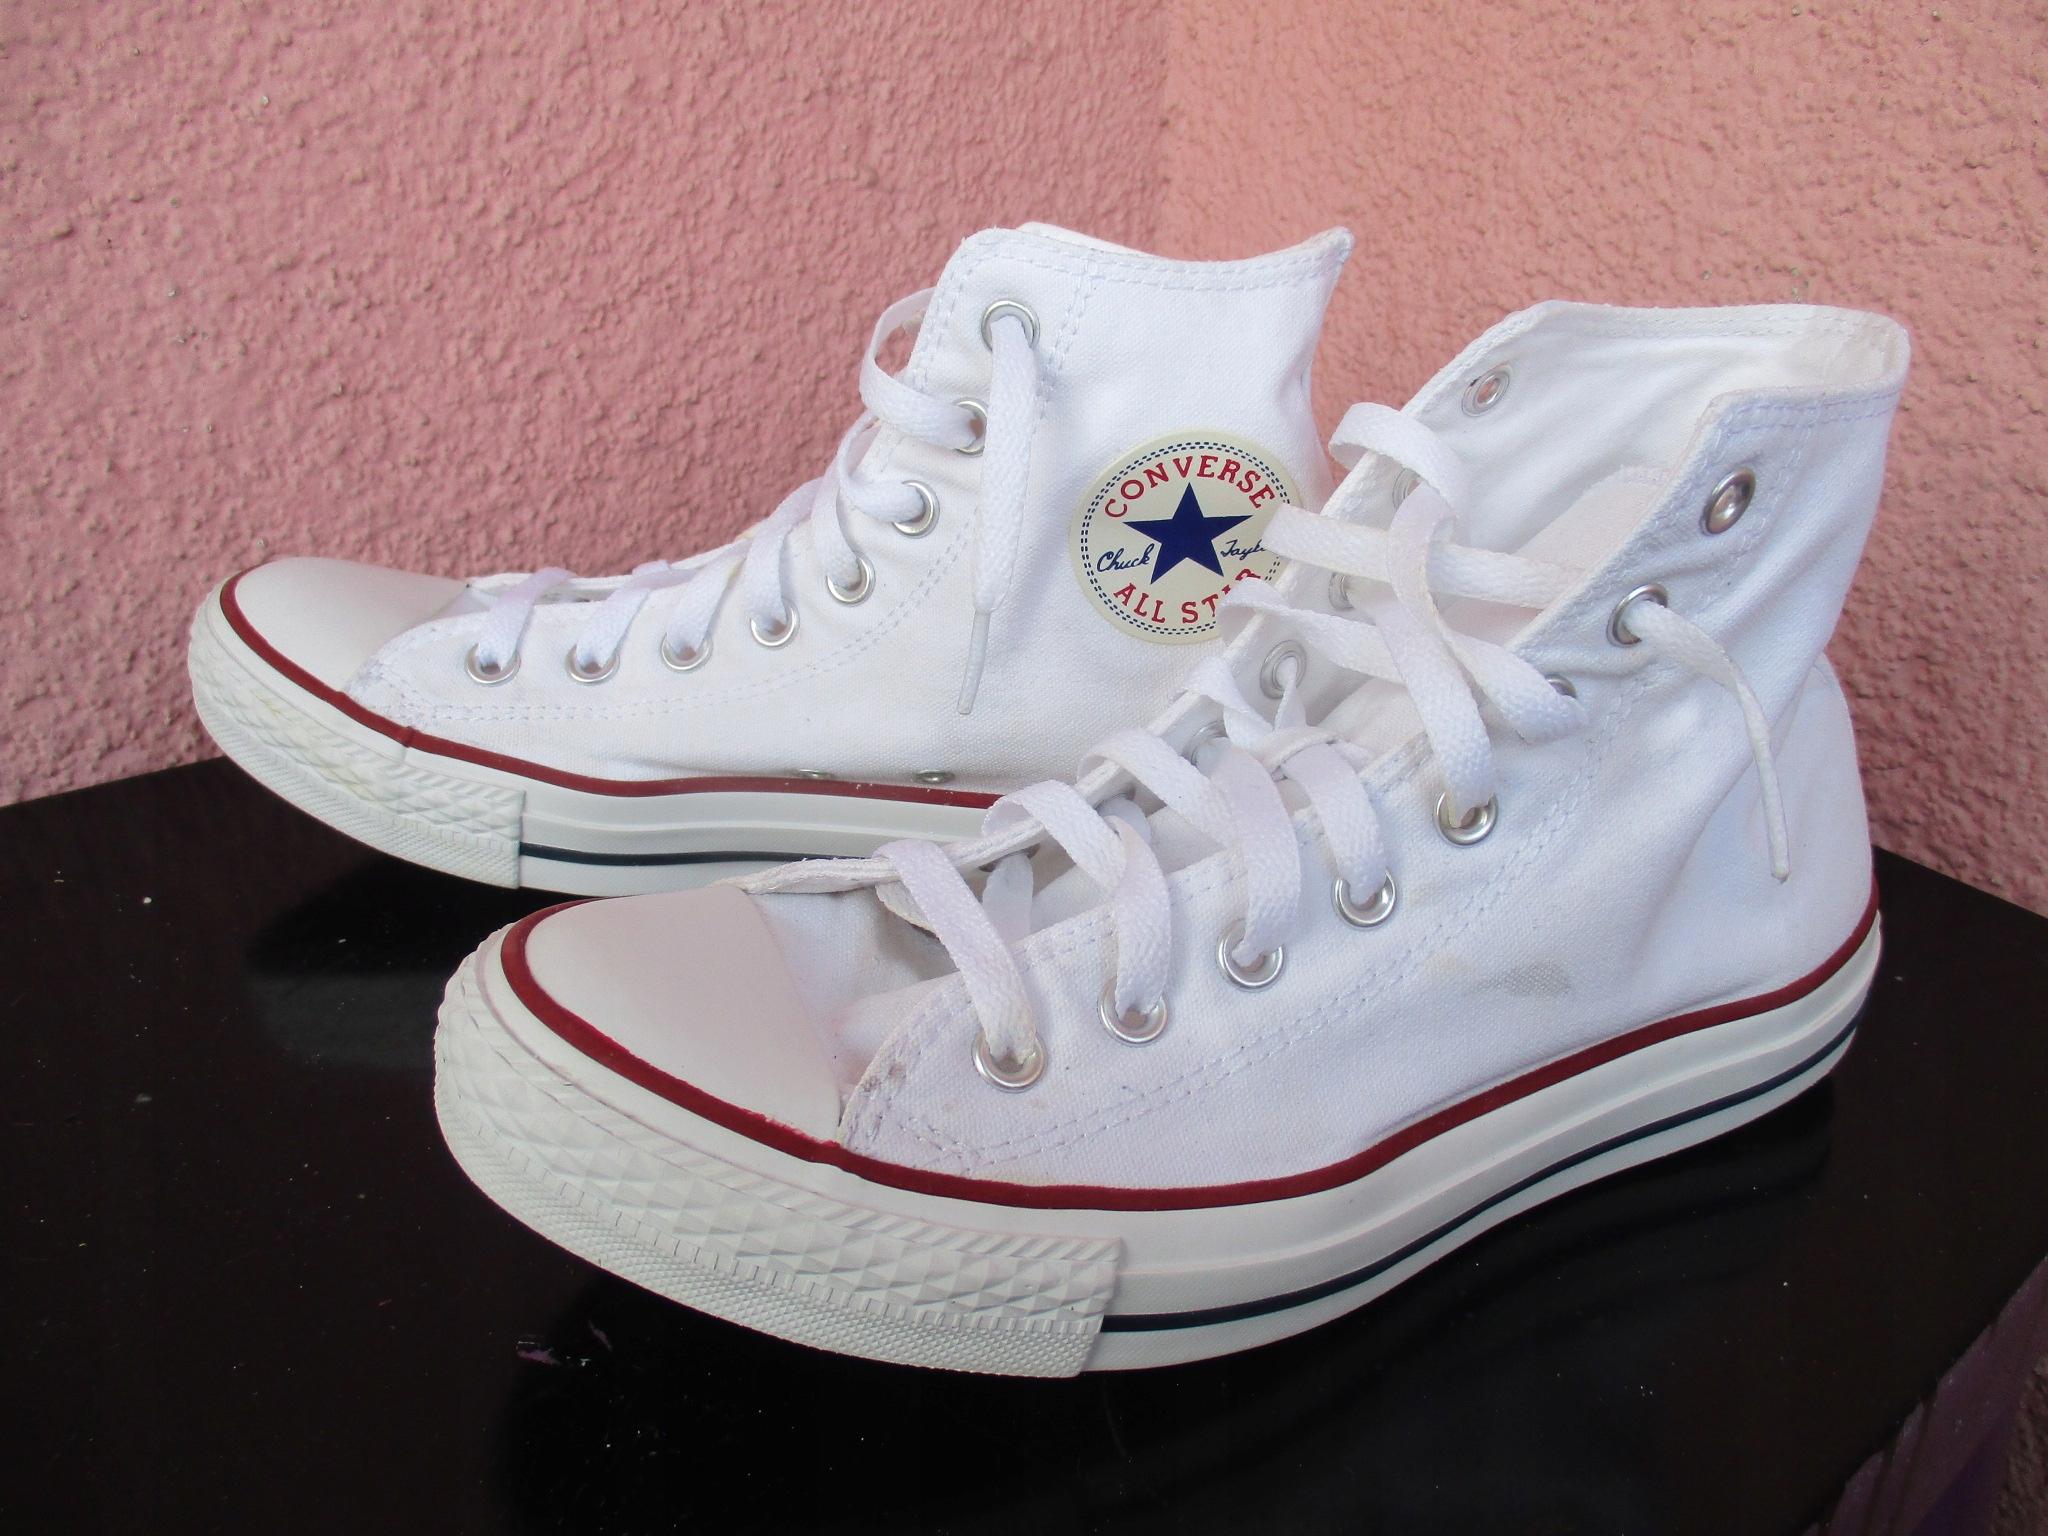 Trampki Converse All Star białe hit r. 41,5